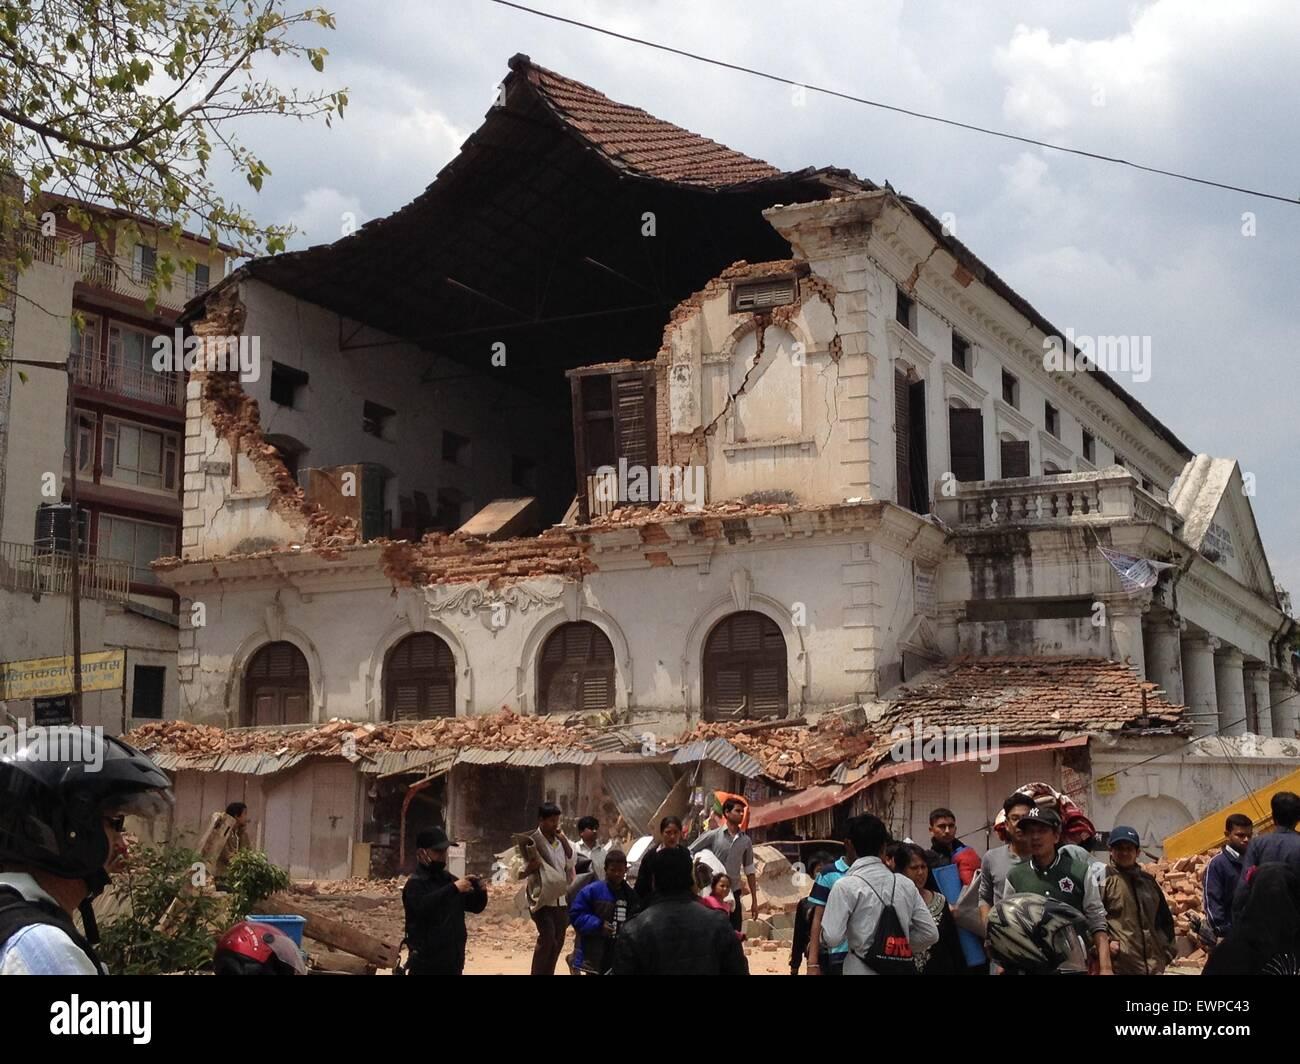 ce7355195f624a Kathmandu Durbar High School collapsed after the earthquake hit Kathmandu  on 25 April 2015 The Nepal earthquake (Saturday 25 April 2015) has  devastated the ...